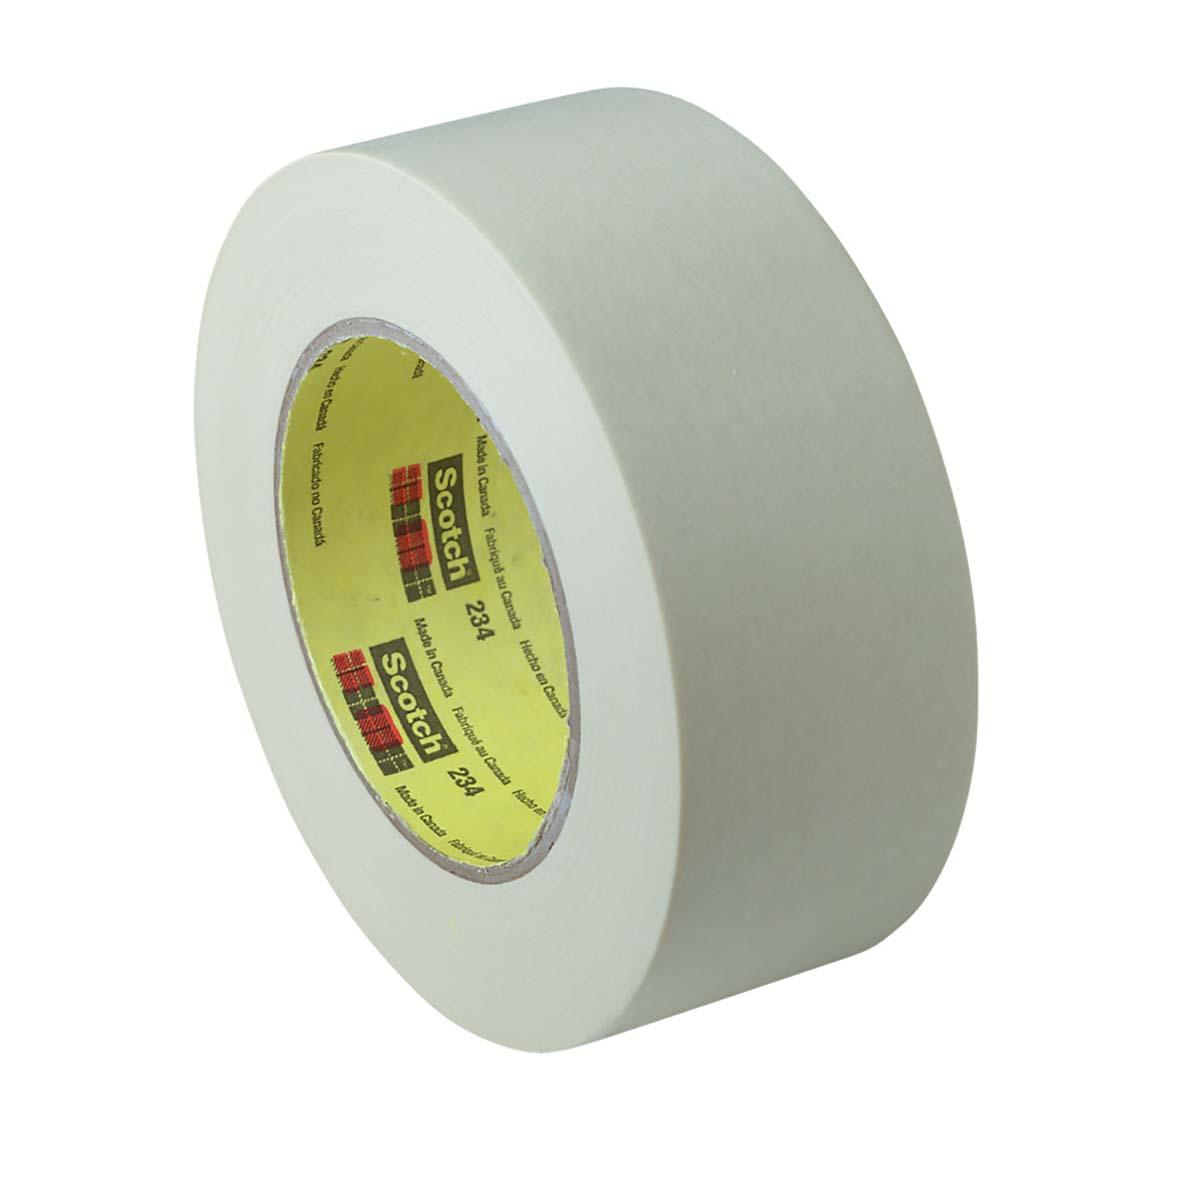 3M General Purpose Masking Tape 234 Tan, 48 mm x 55 m 5.9 mil, 24 per case Bulk